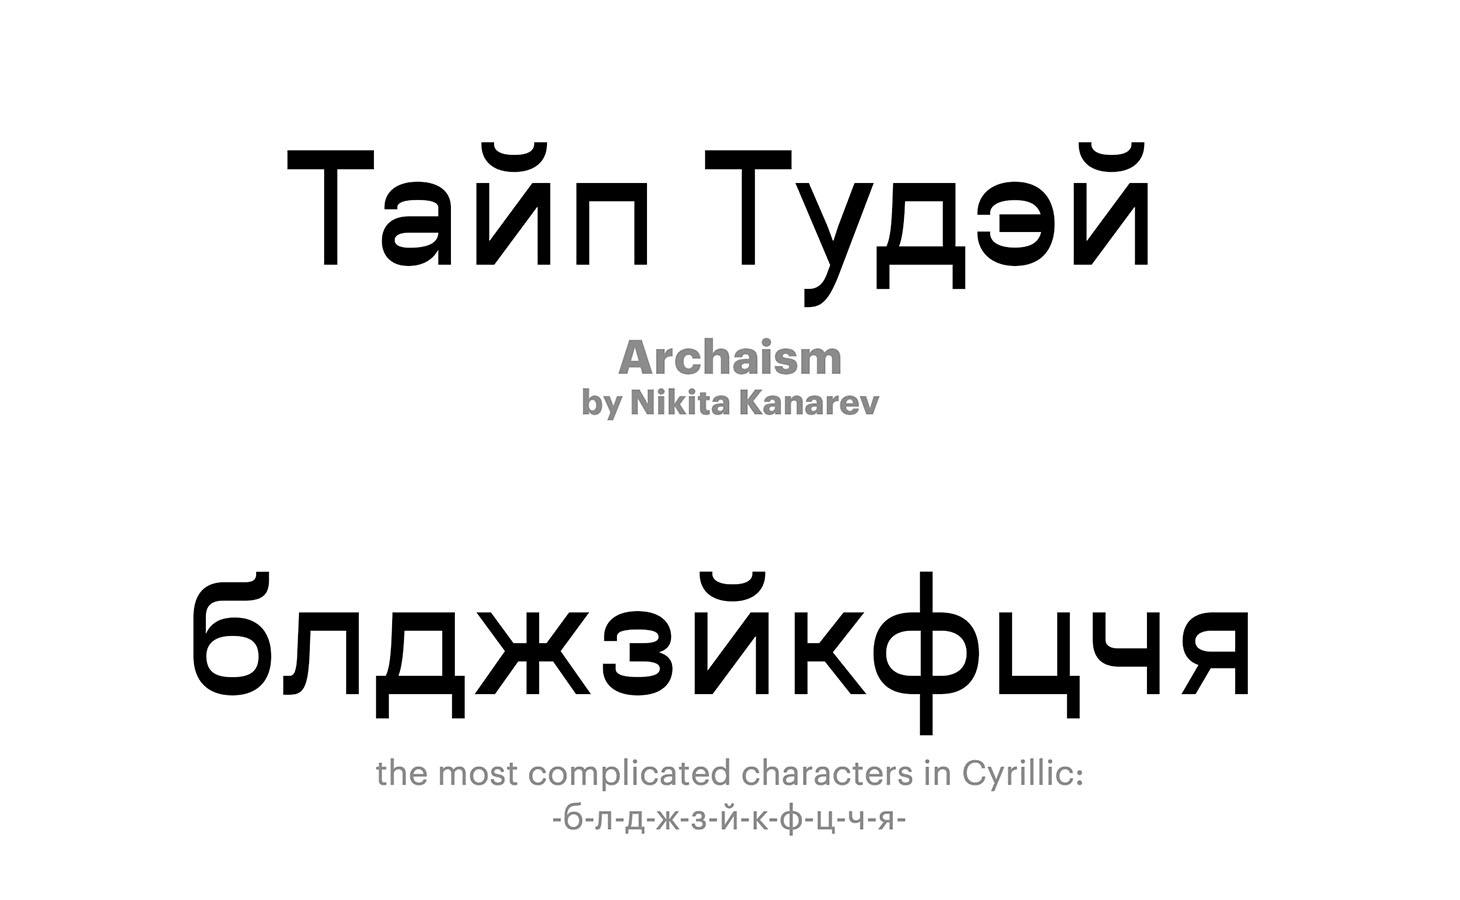 Archaism